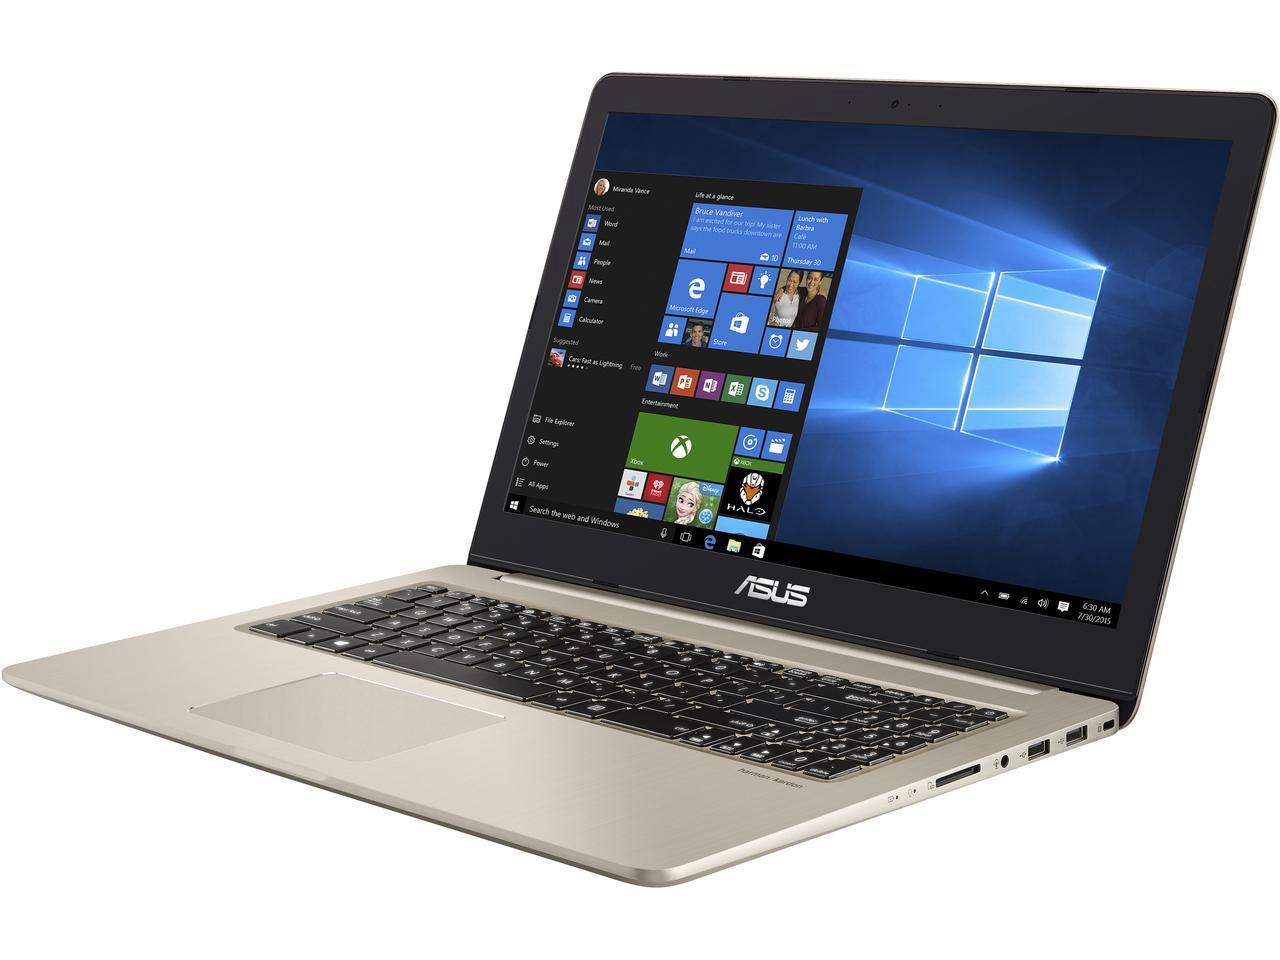 Asus Vivobook M580VD Thin & Light laptop: 15.6'' FHD IPS, i7-7700HQ, 16GB DDR4, GTX 1050 4GB, 256GB SSD, 1TB HDD @ $979 + F/S